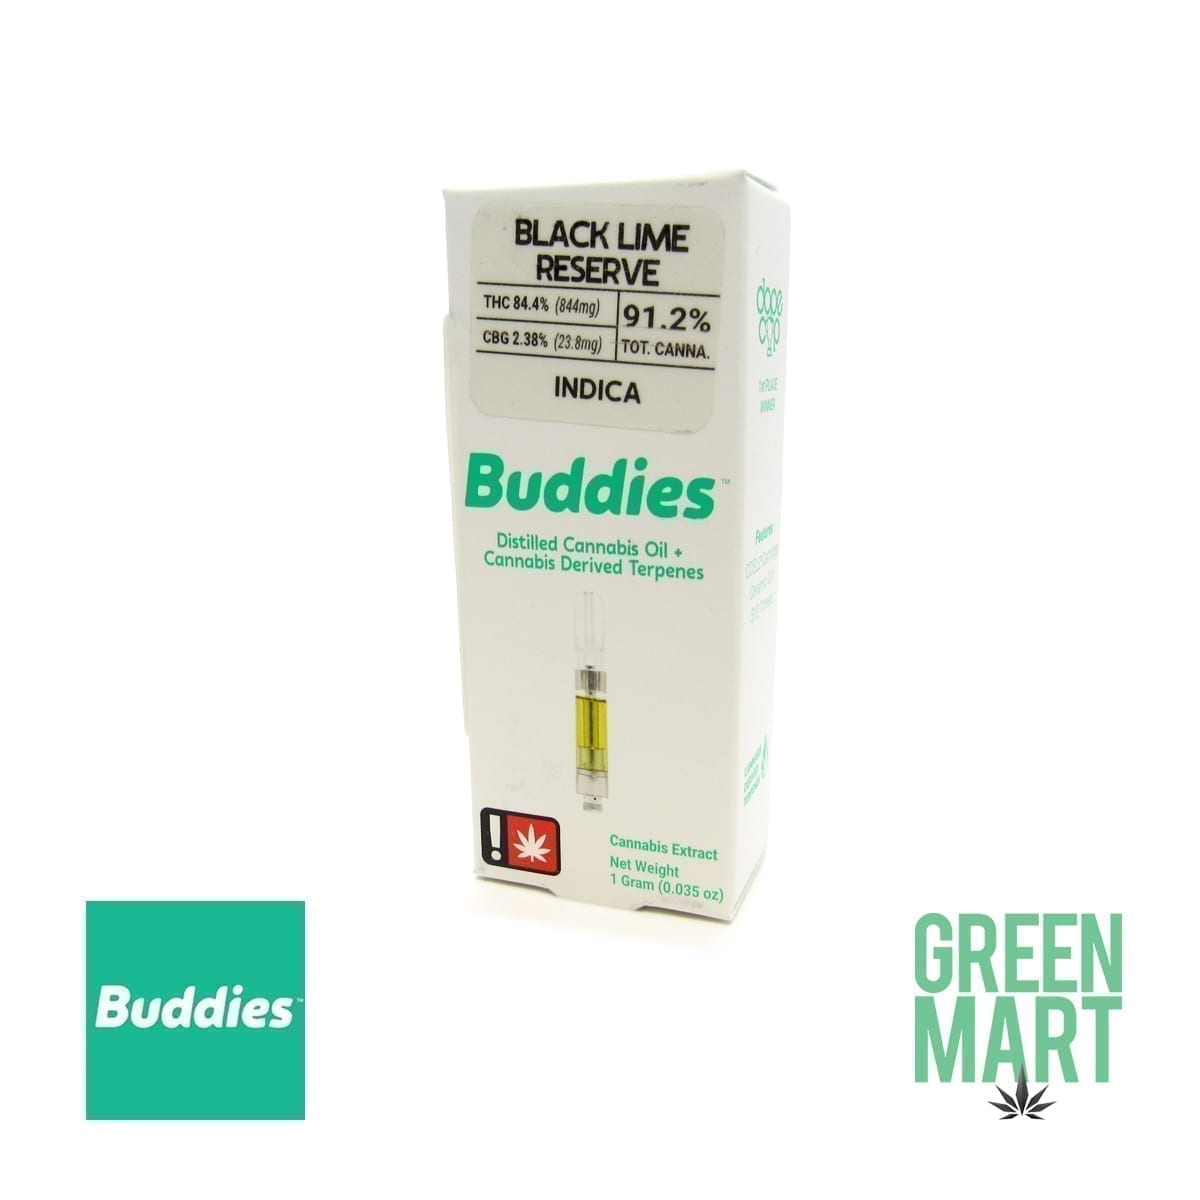 Buddies Brand THC Dripper - Black Lime Reserve